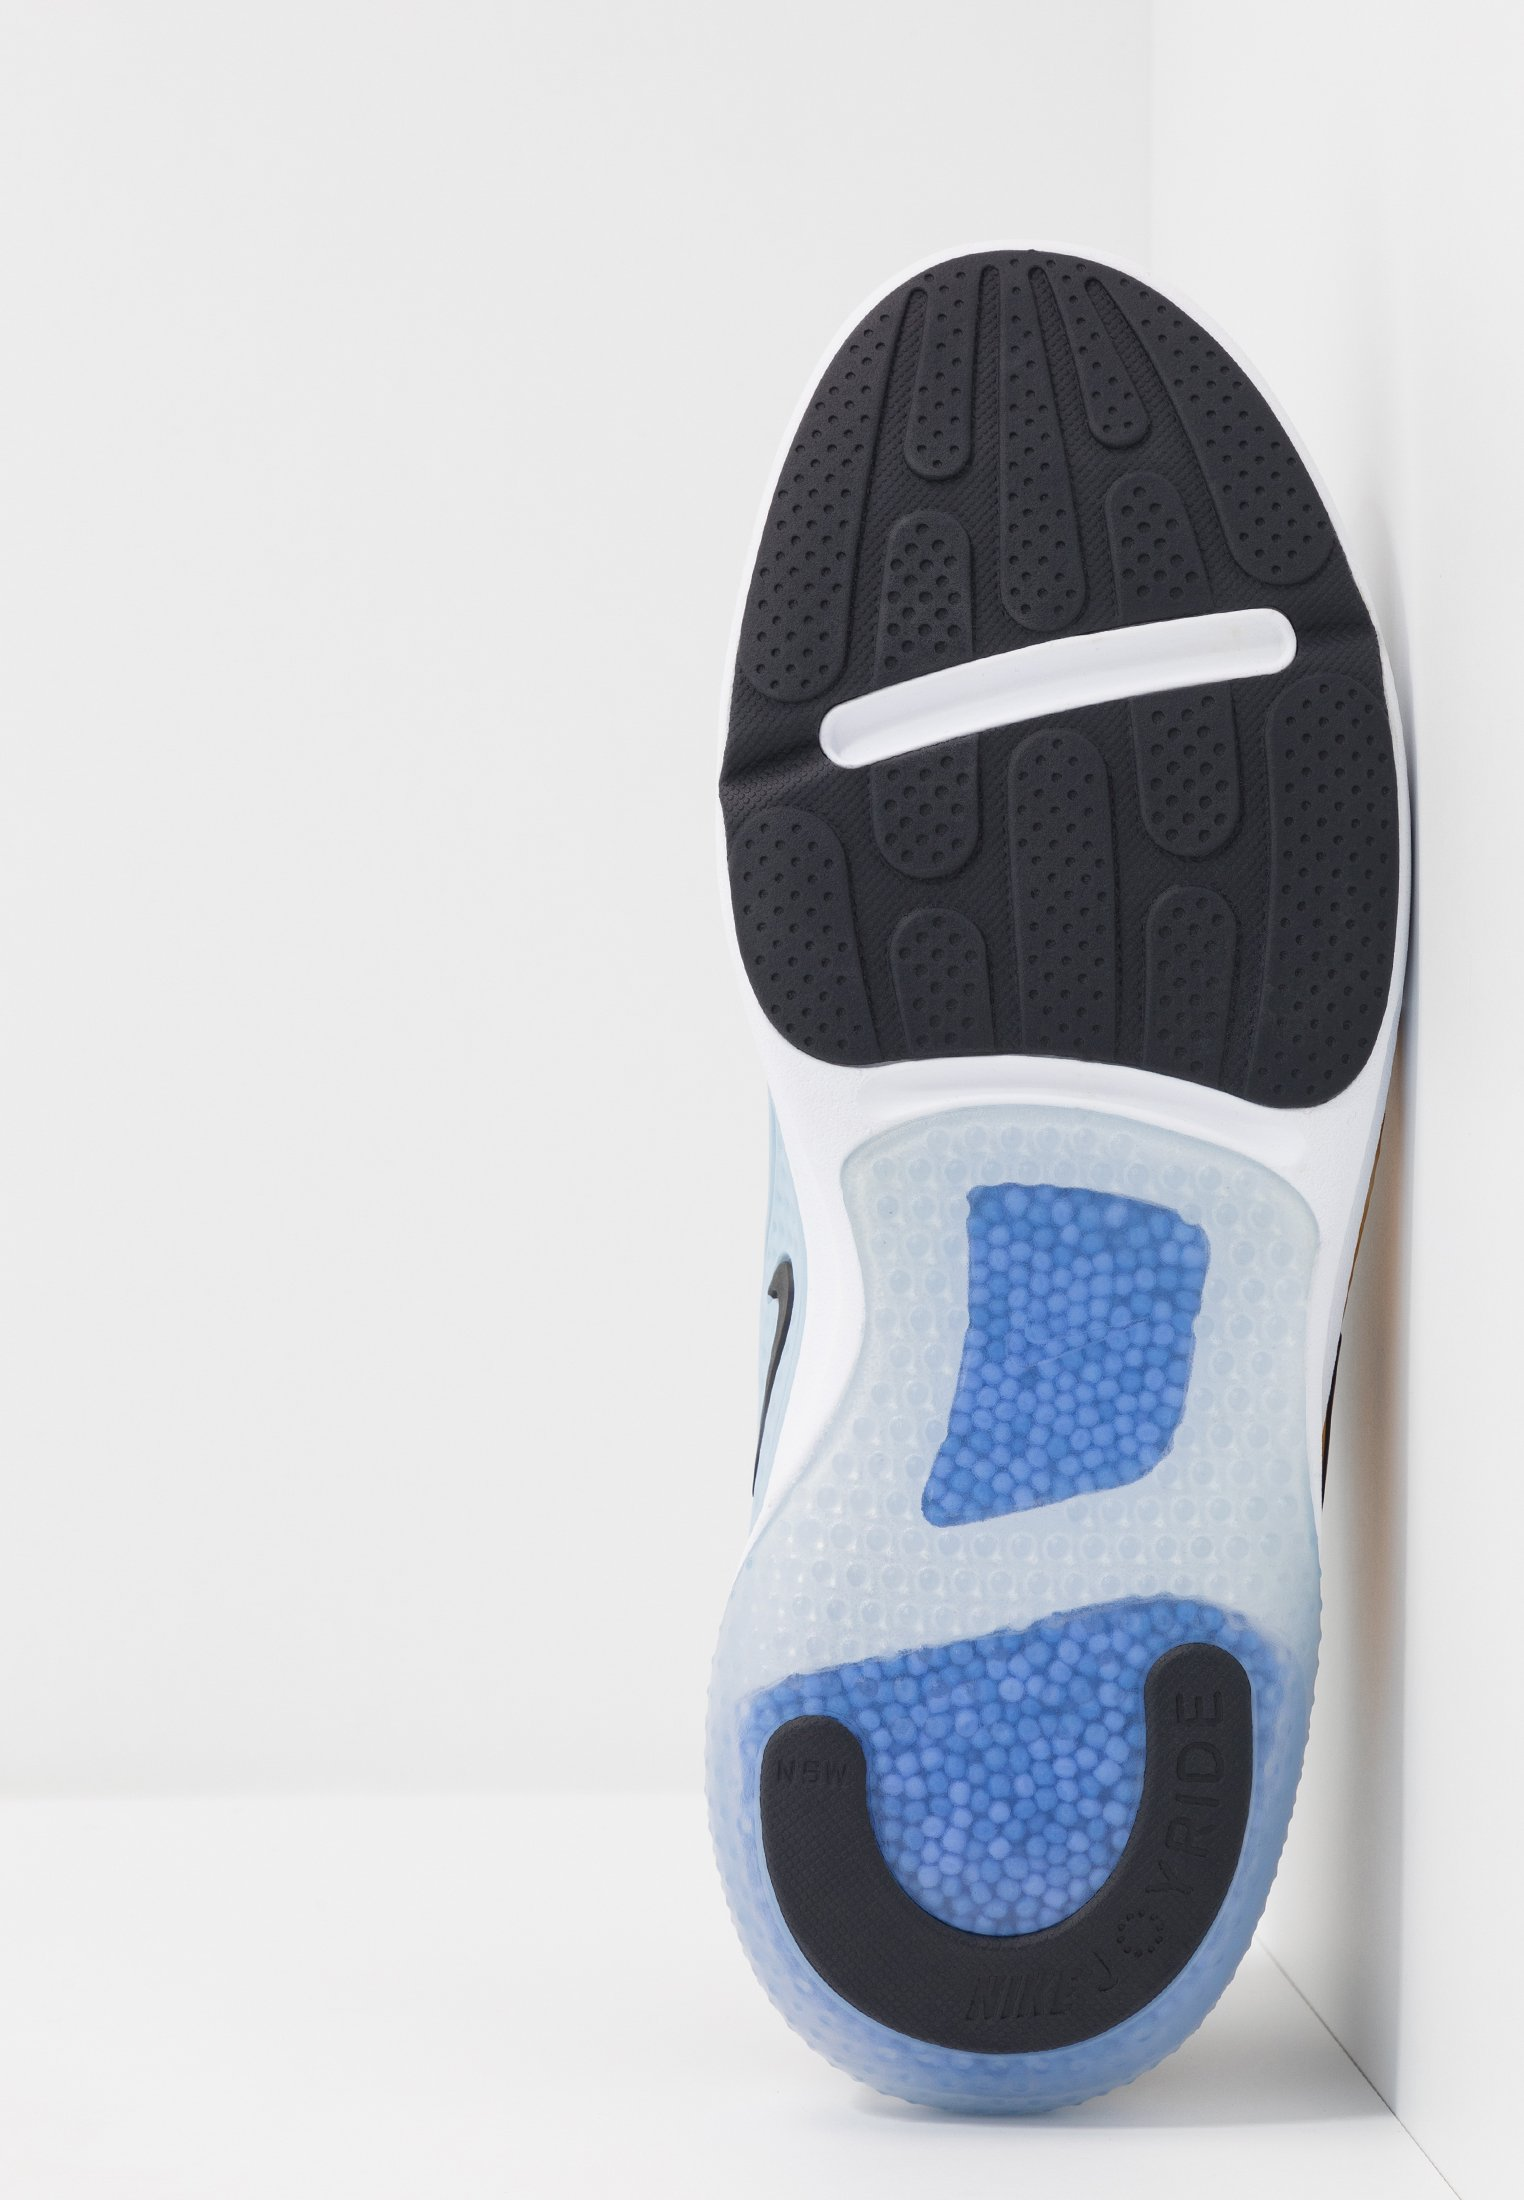 basses Nike dark sulfur navy white dark Sportswear midnight obsidian JOYRIDEBaskets Yb6yf7vg